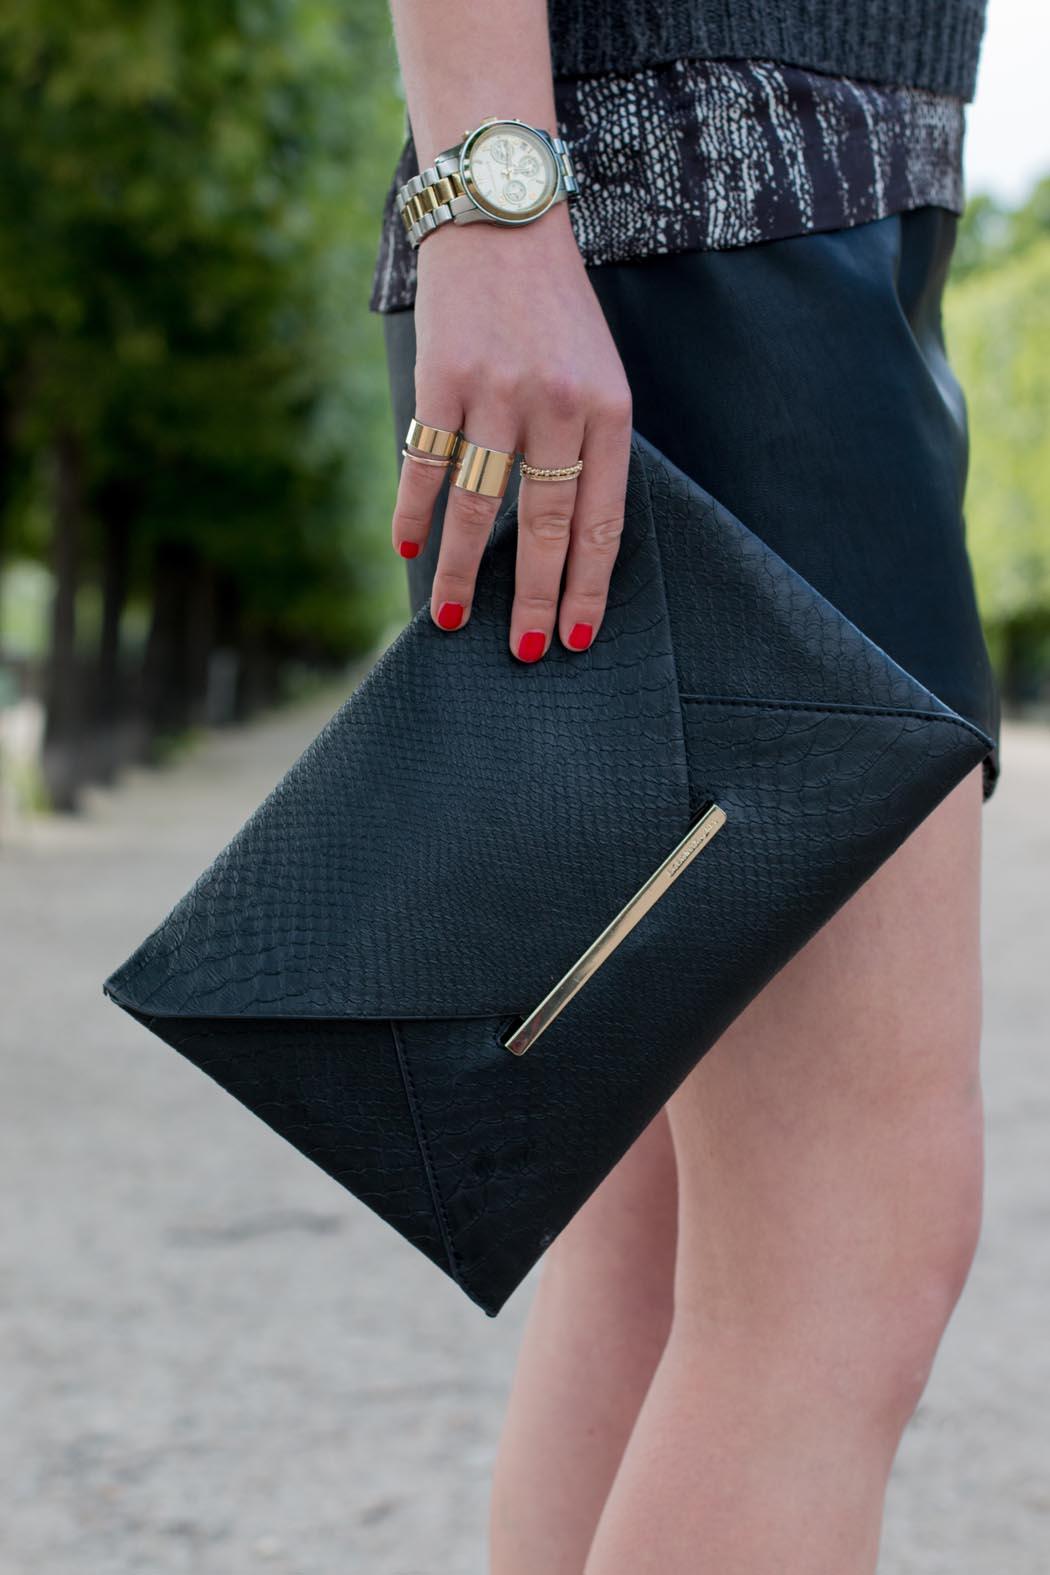 Lindarella-Paris-Fashionblogger-Michael-Kors-Bcbg-allblack-9